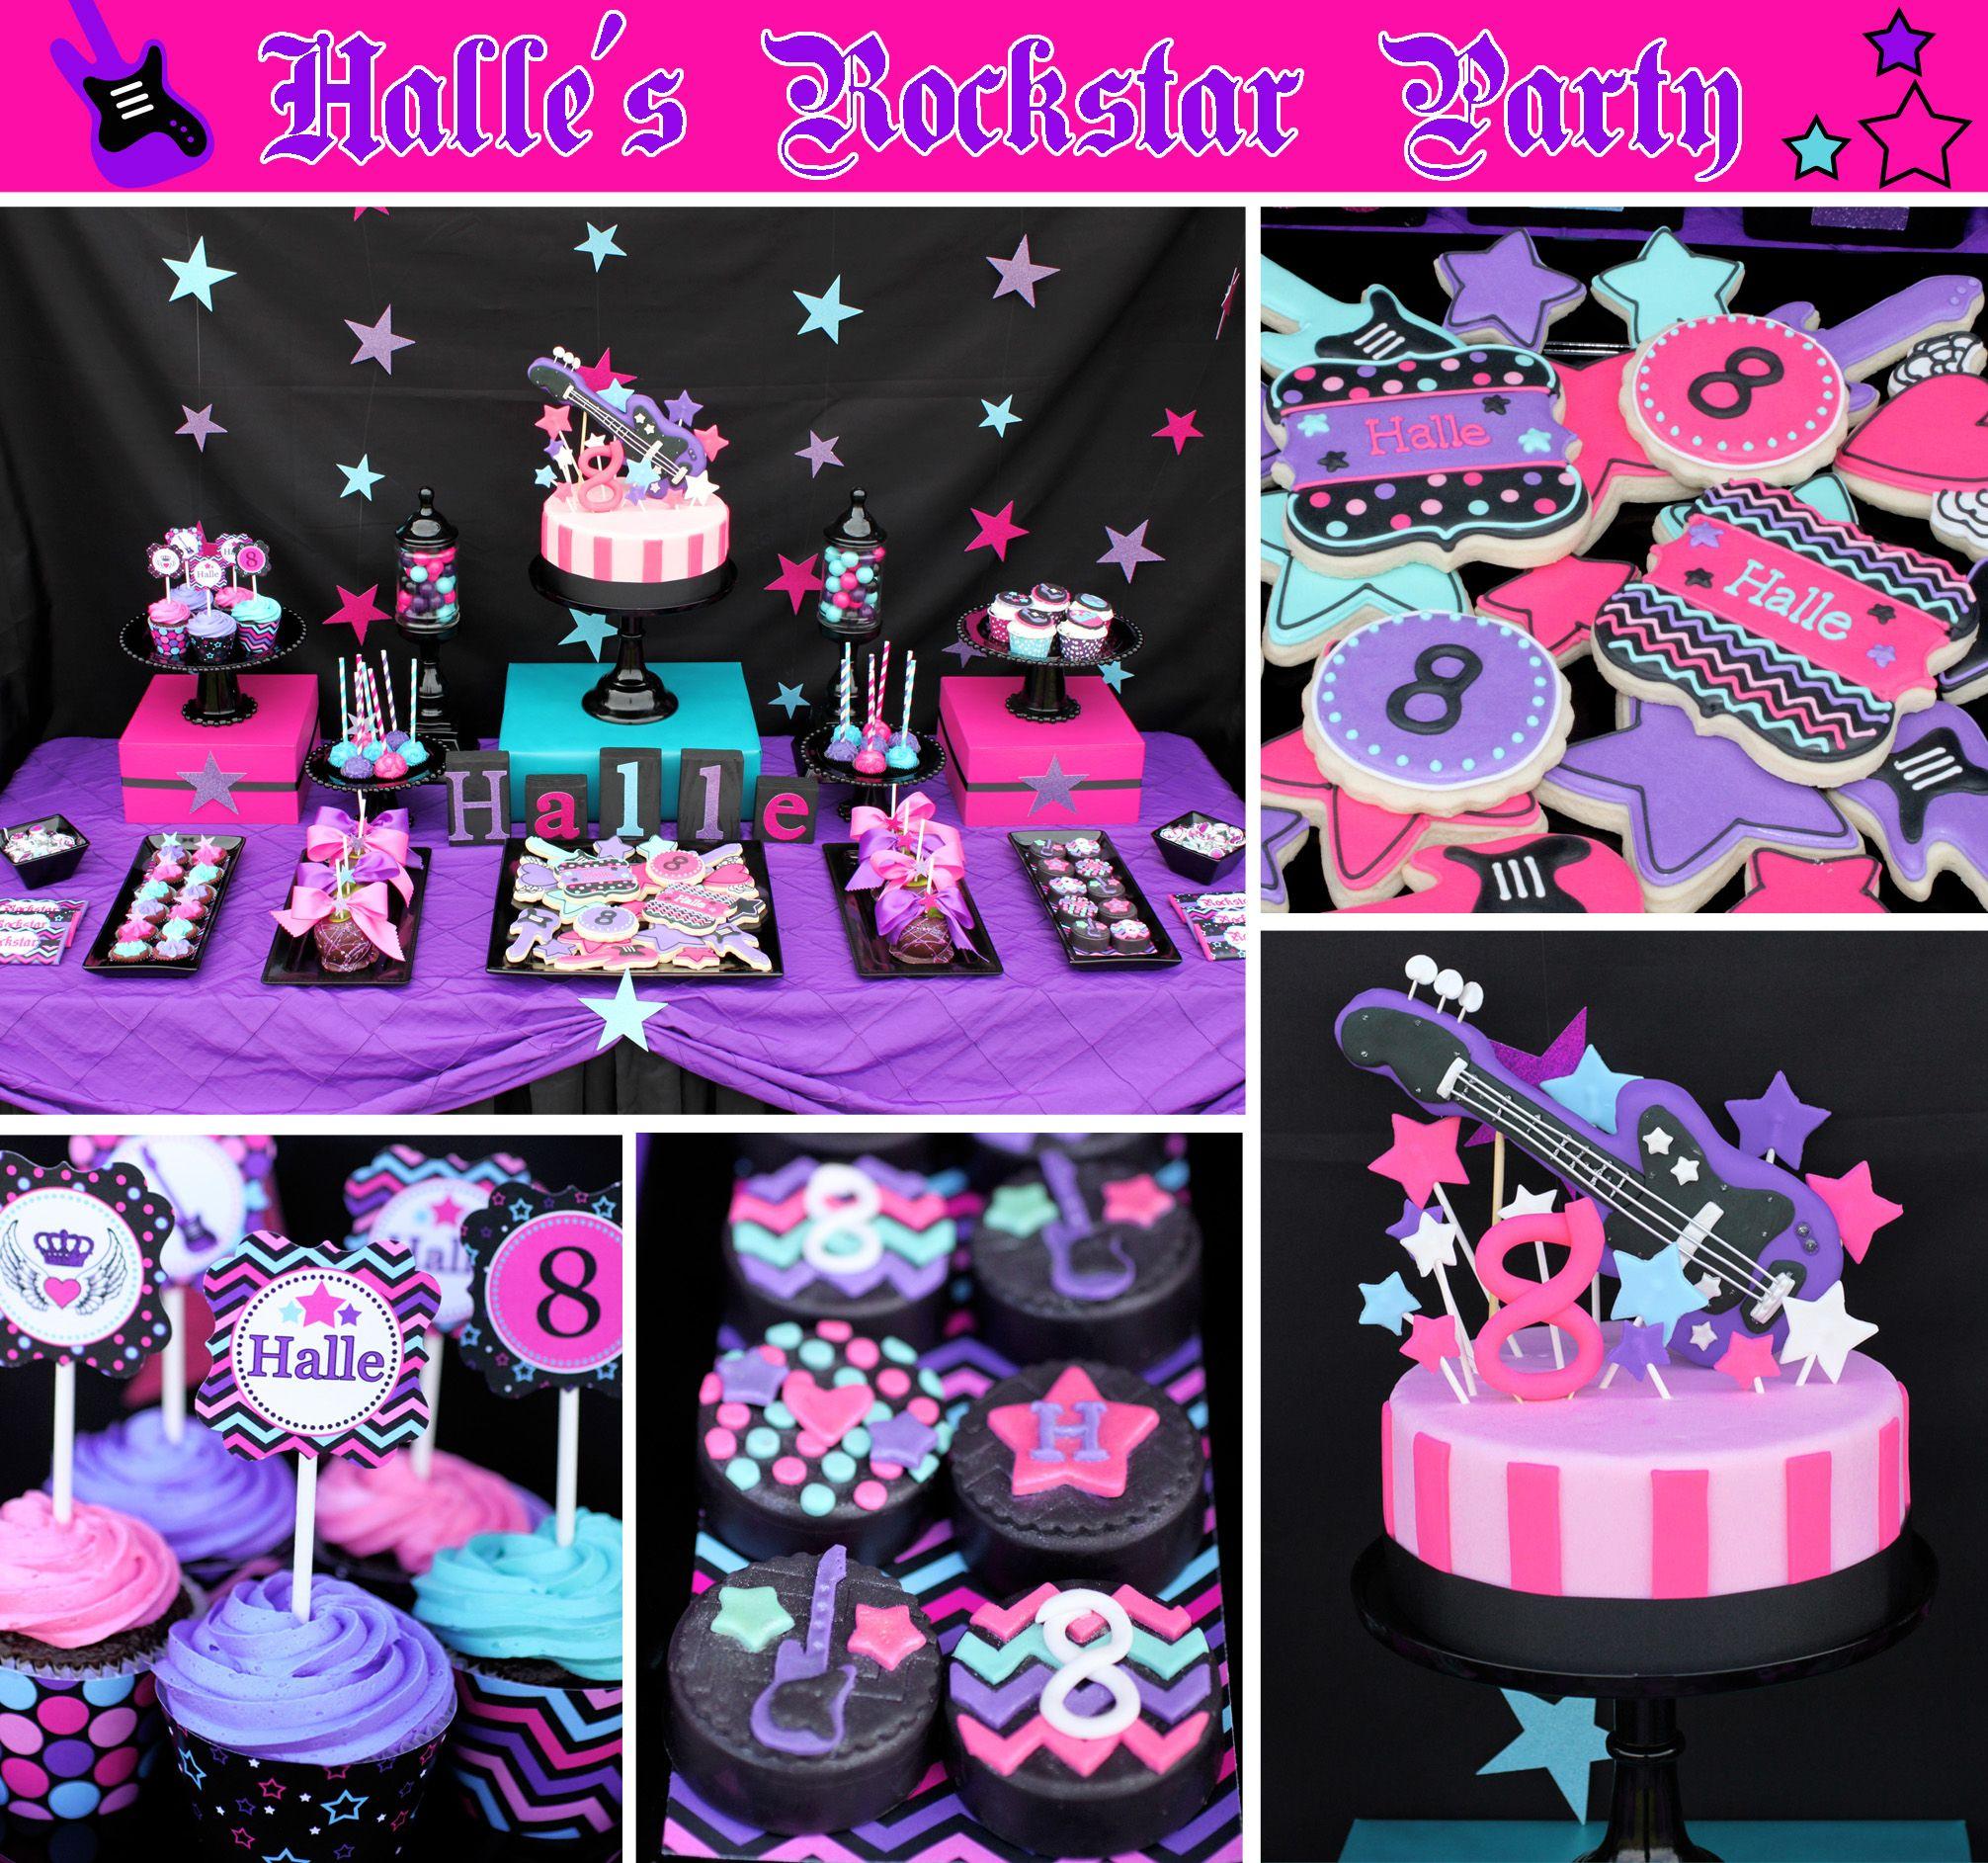 Halles rockstar birthday party cake cupcakes rock star | Rockstar ...